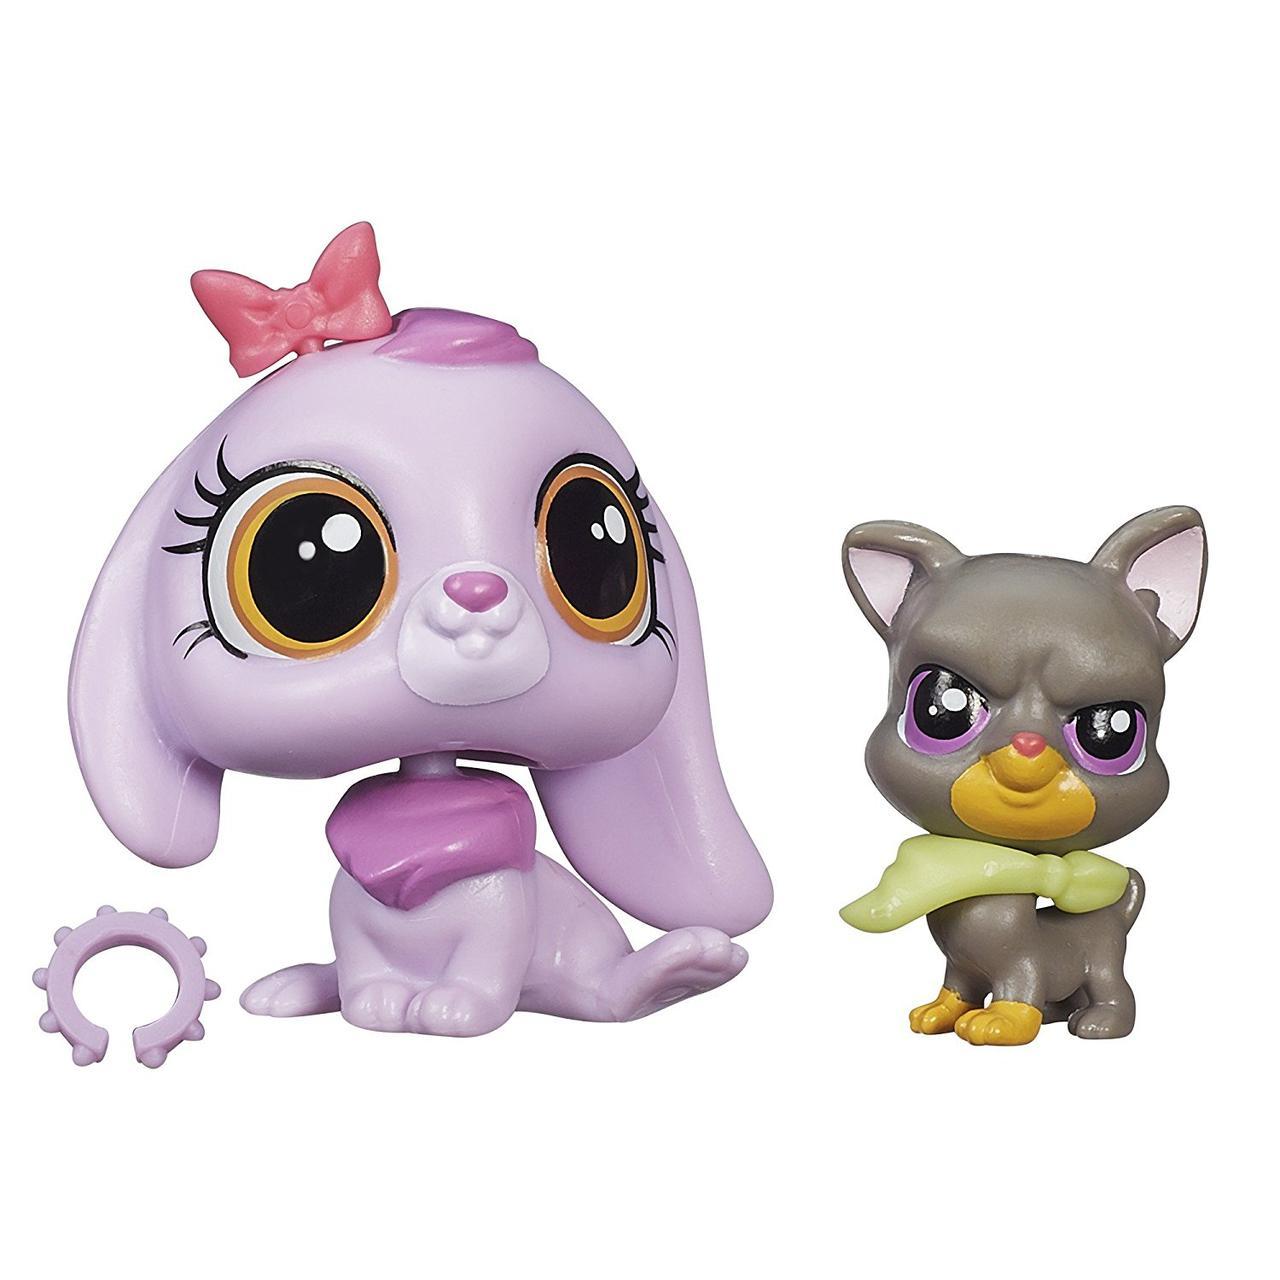 Littlest Pet Shop Зверюшка и ее малыш: кролик Lilac Bennett и доберман